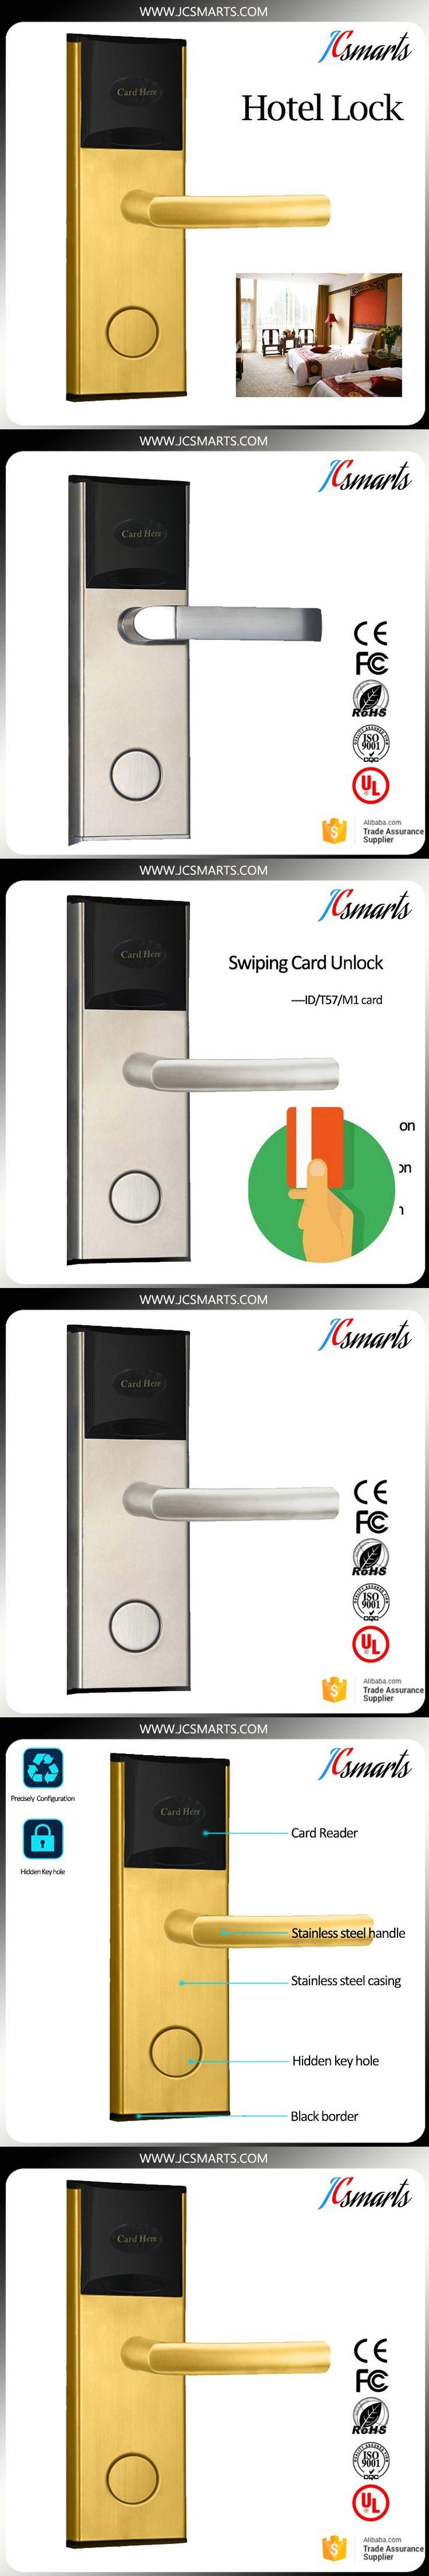 cerraduras para puertas electronicas electromagnetic door locks intelligent hotel lock with management software